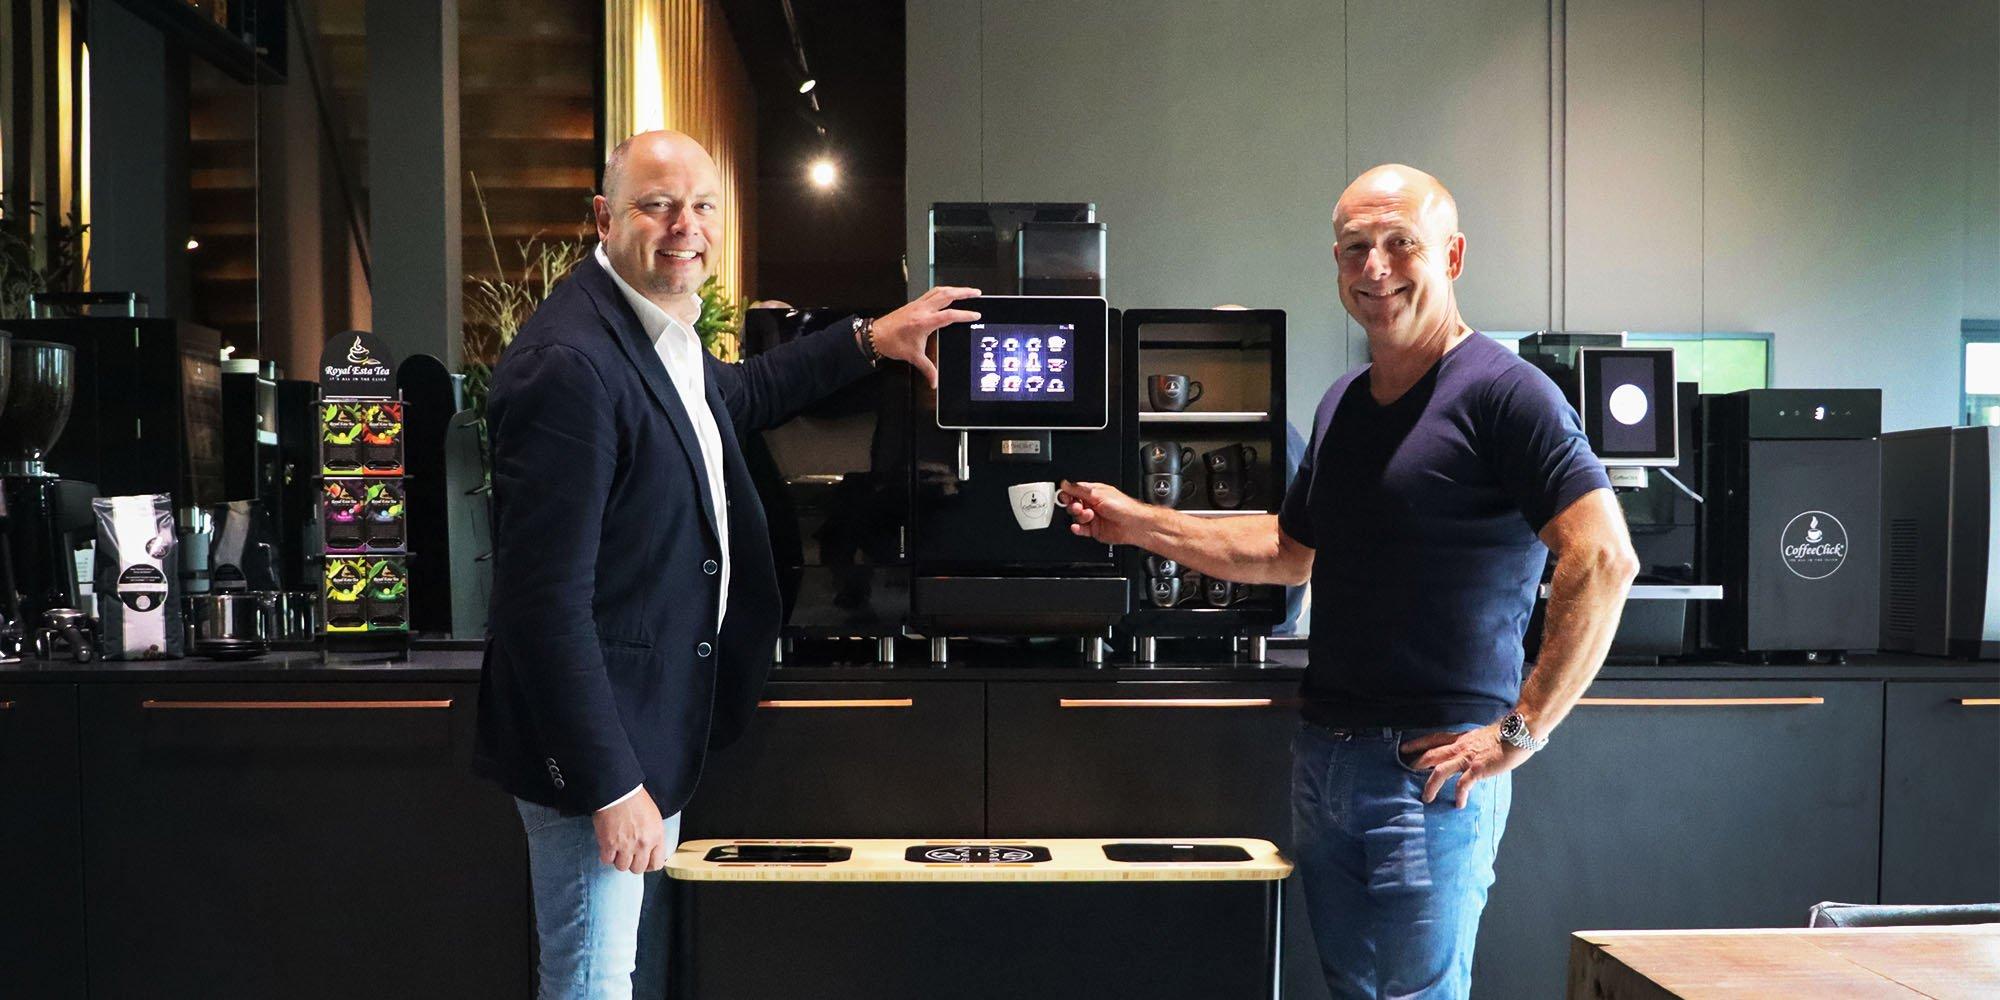 coffeeclick marcel afvalbak remco smits samenwerking